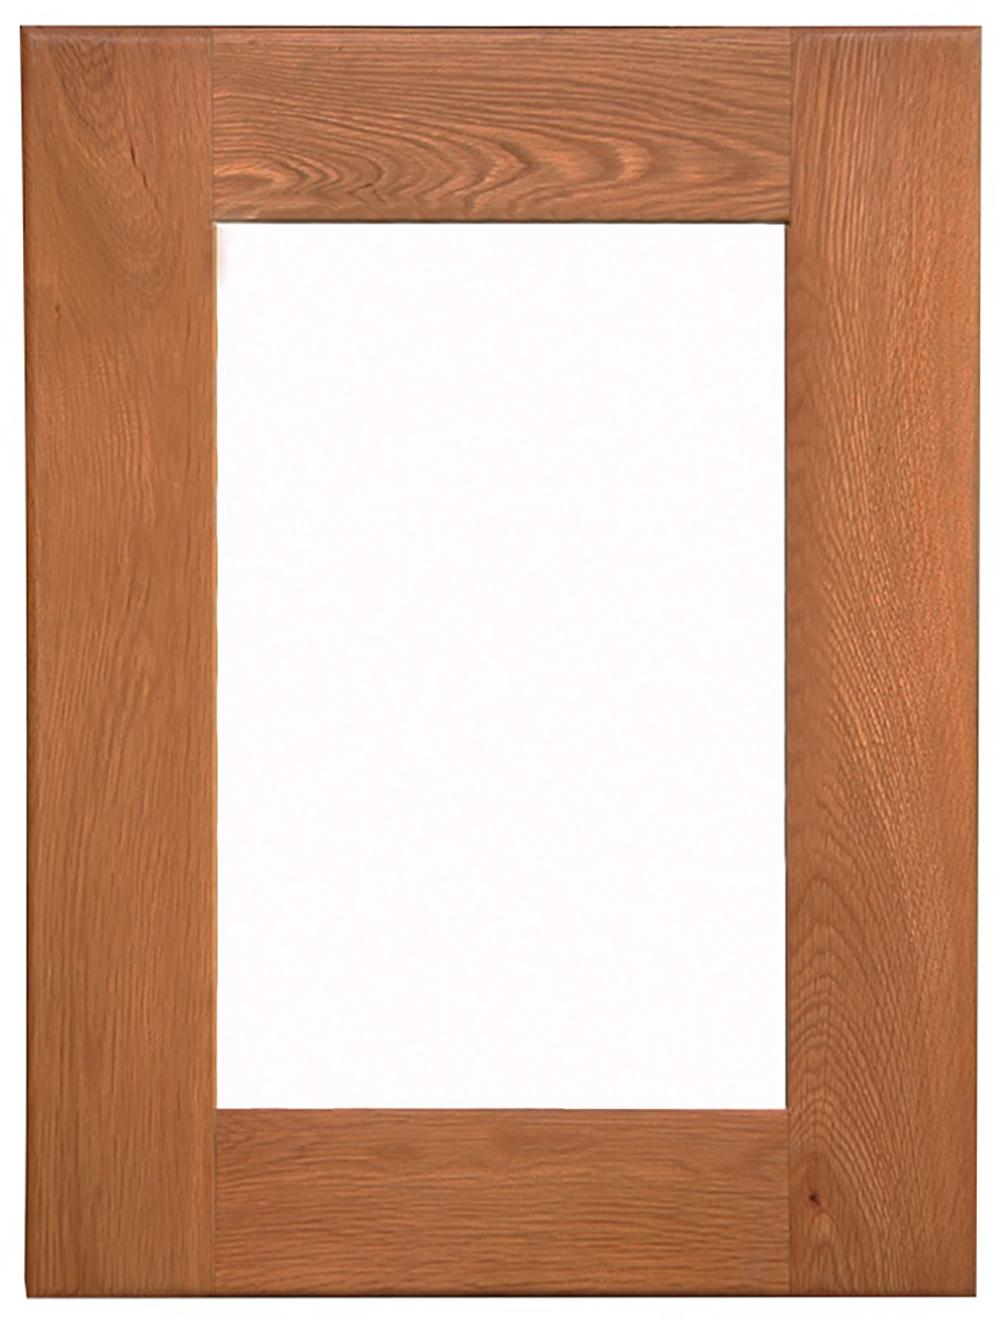 Galloway oak small wall mirror glenross furniture for Small wall mirrors